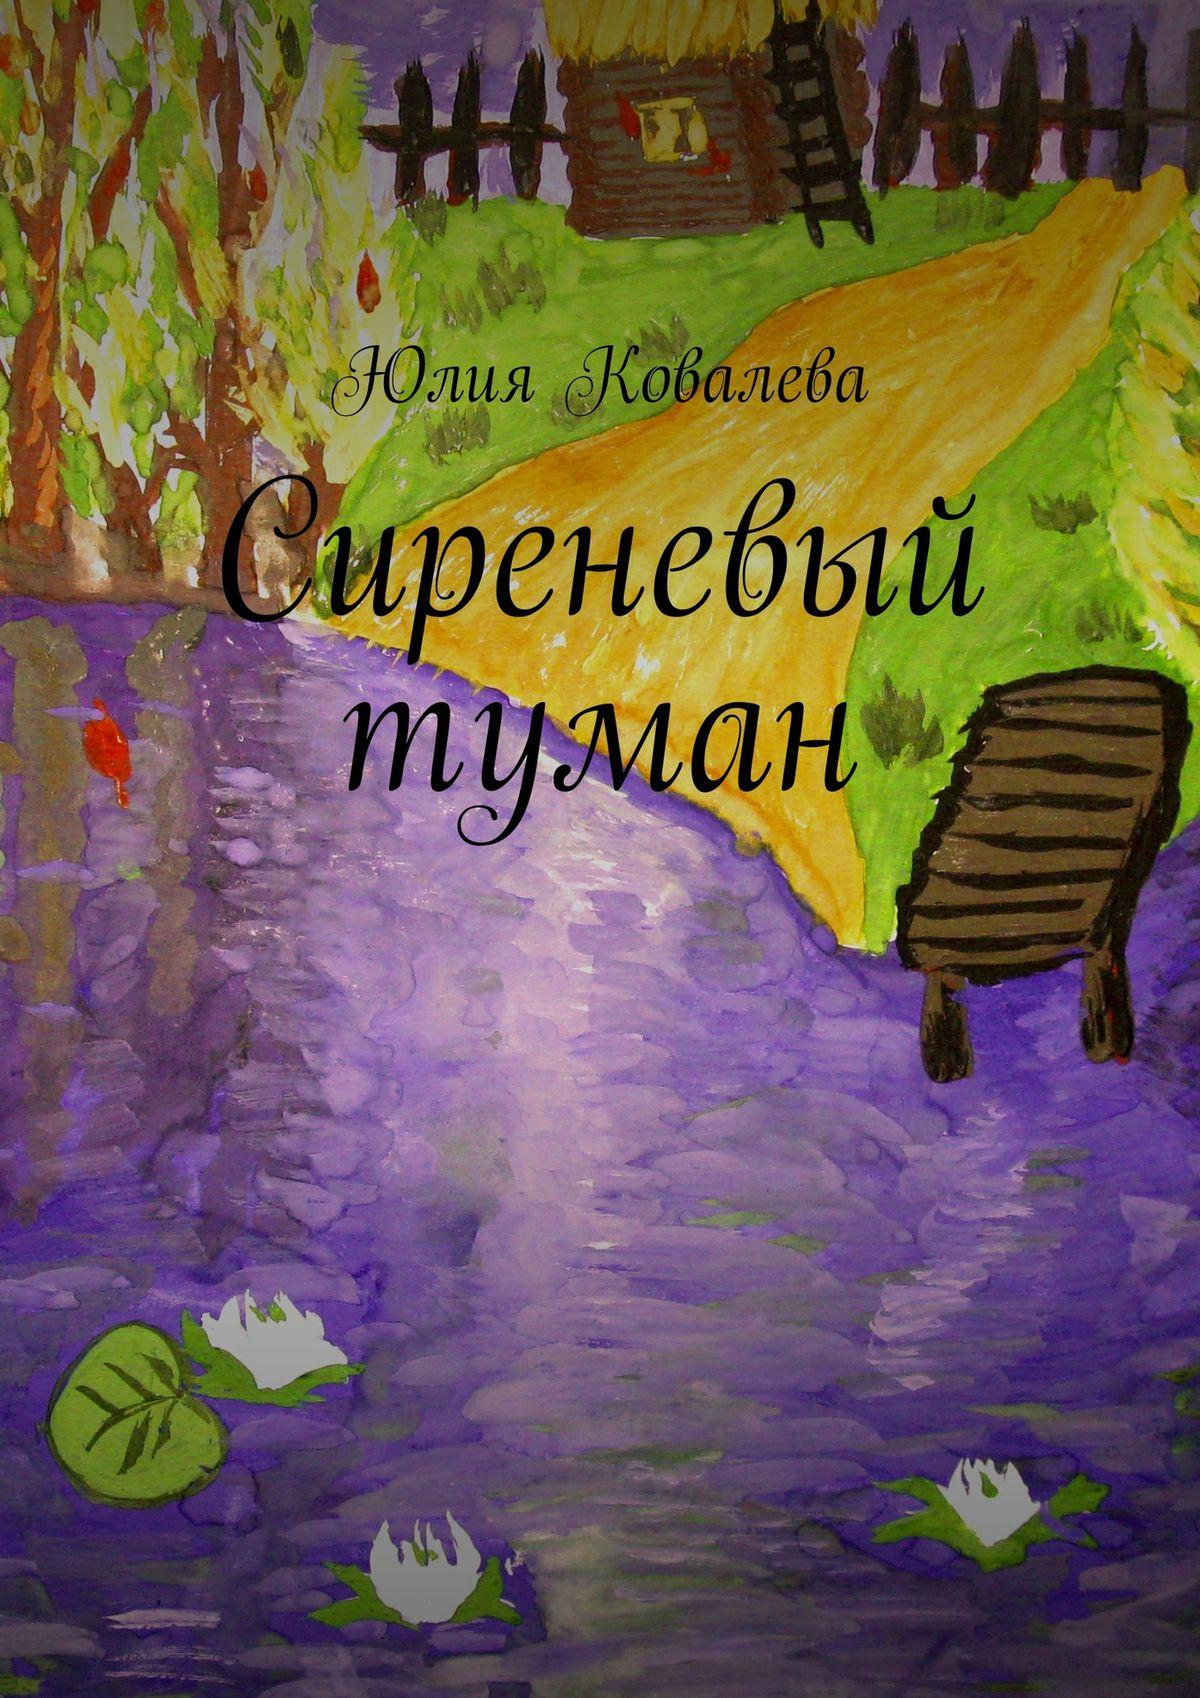 Юлия Ковалева Сиреневый туман rk 184кукла княжна александра